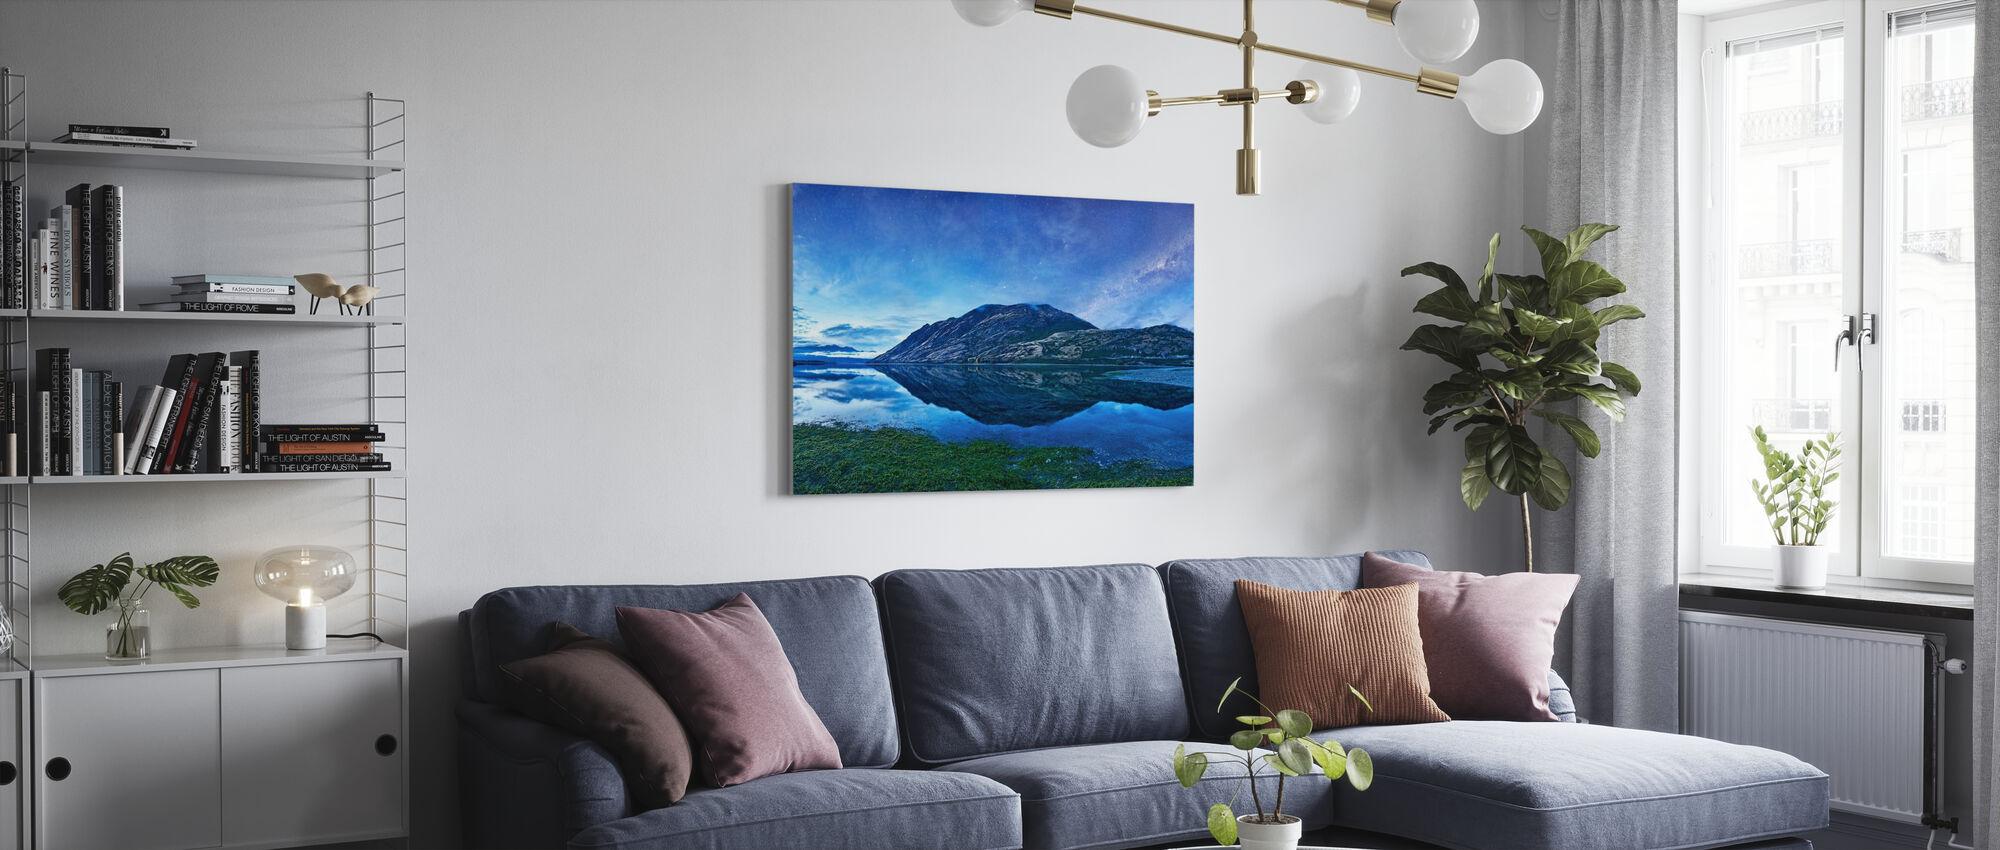 Sjö Hawea, NZ - Canvastavla - Vardagsrum